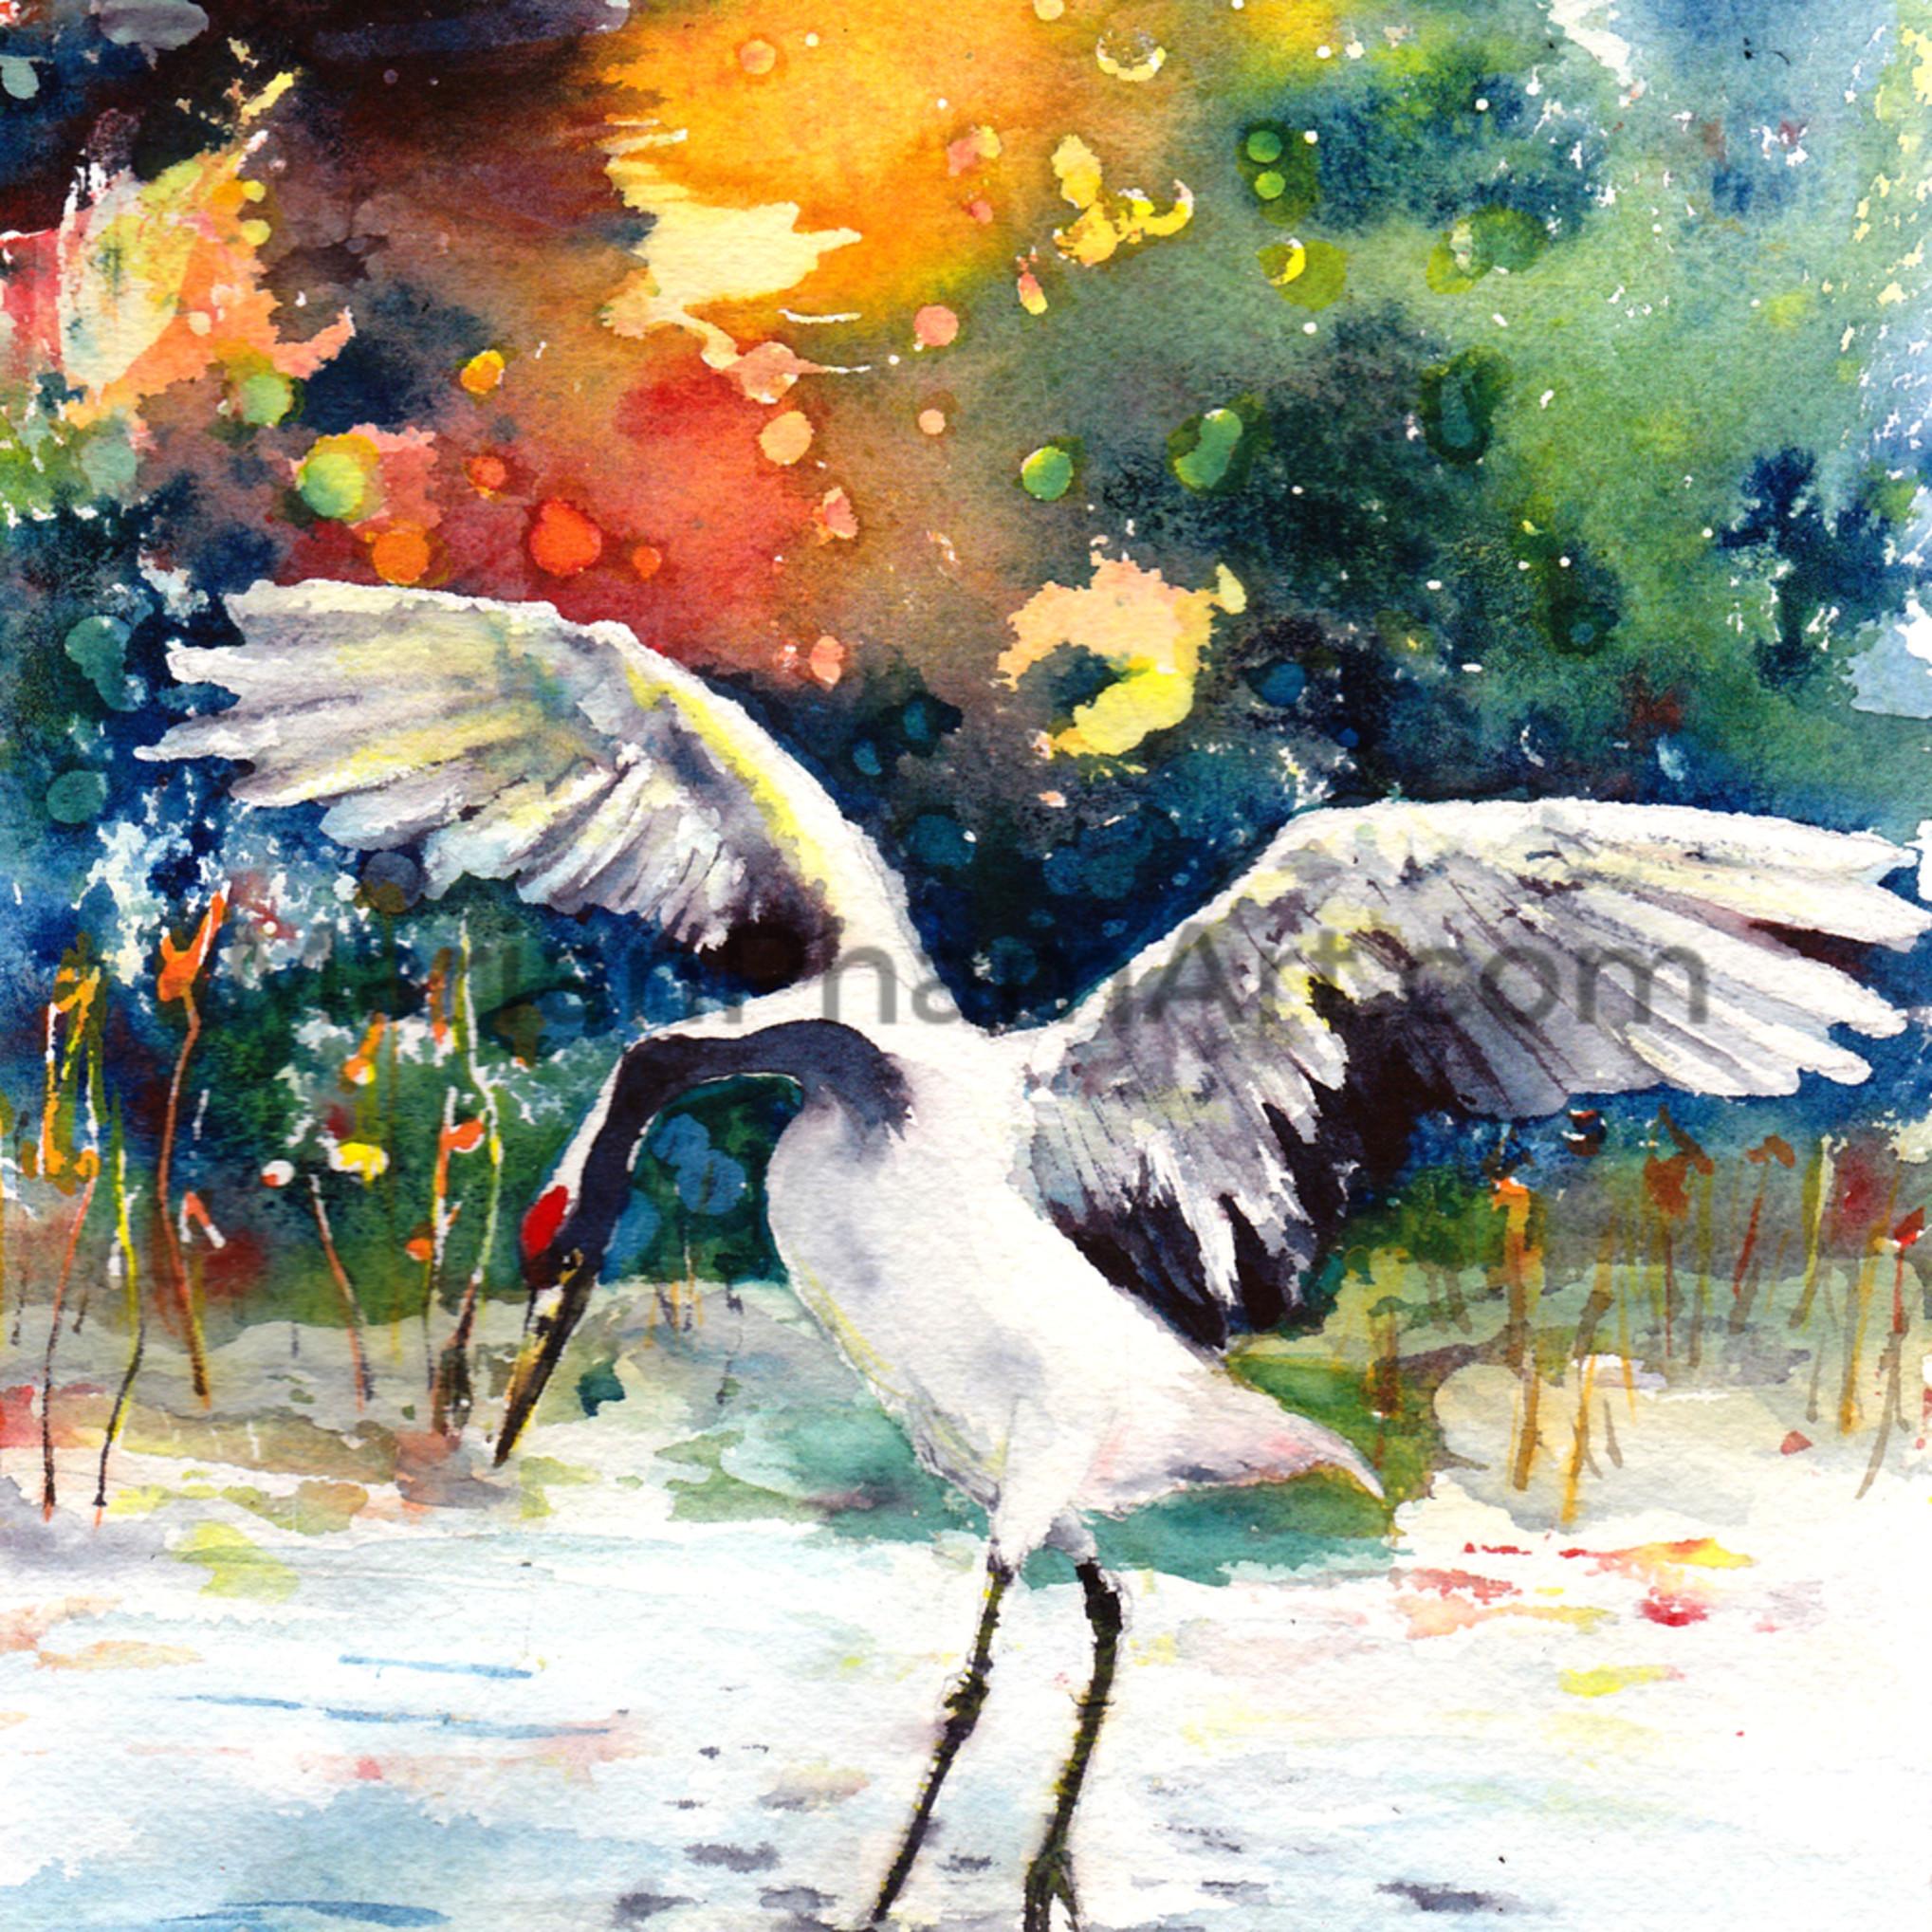 Print crane on7yqi